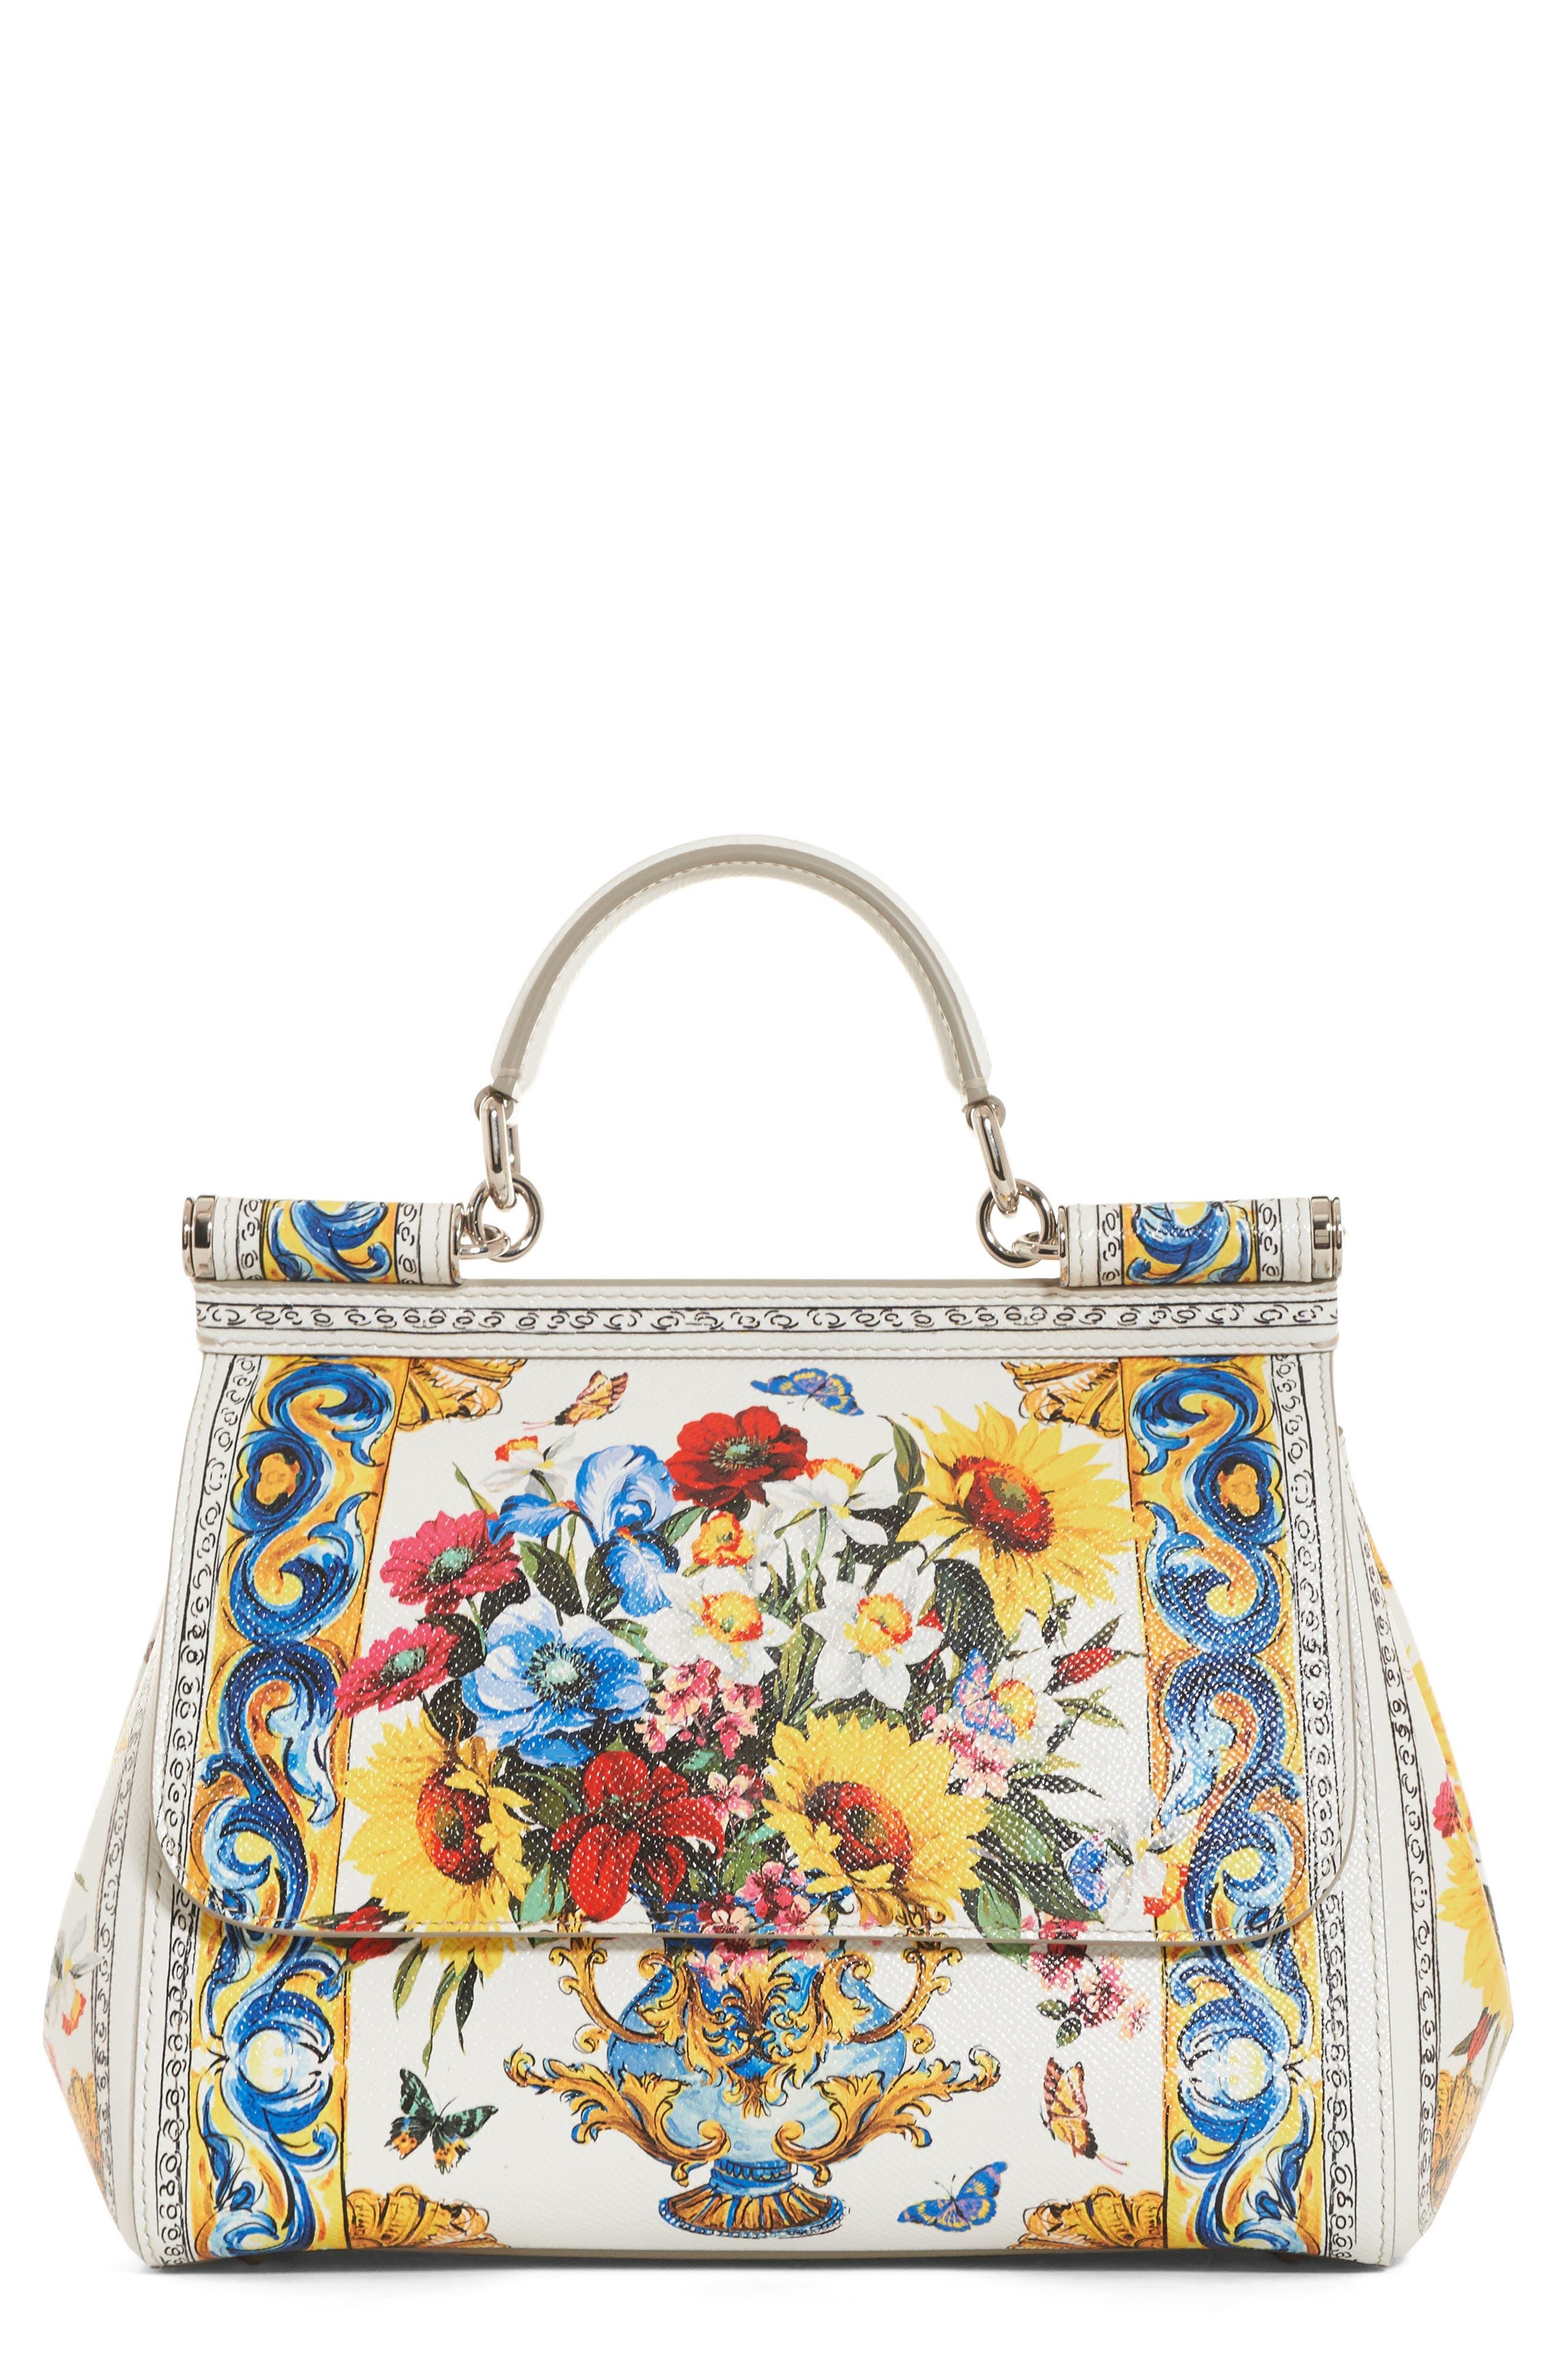 Alternate Image 1 Selected - Dolce&Gabbana Medium Maiolica Fiori Sicily Leather Satchel